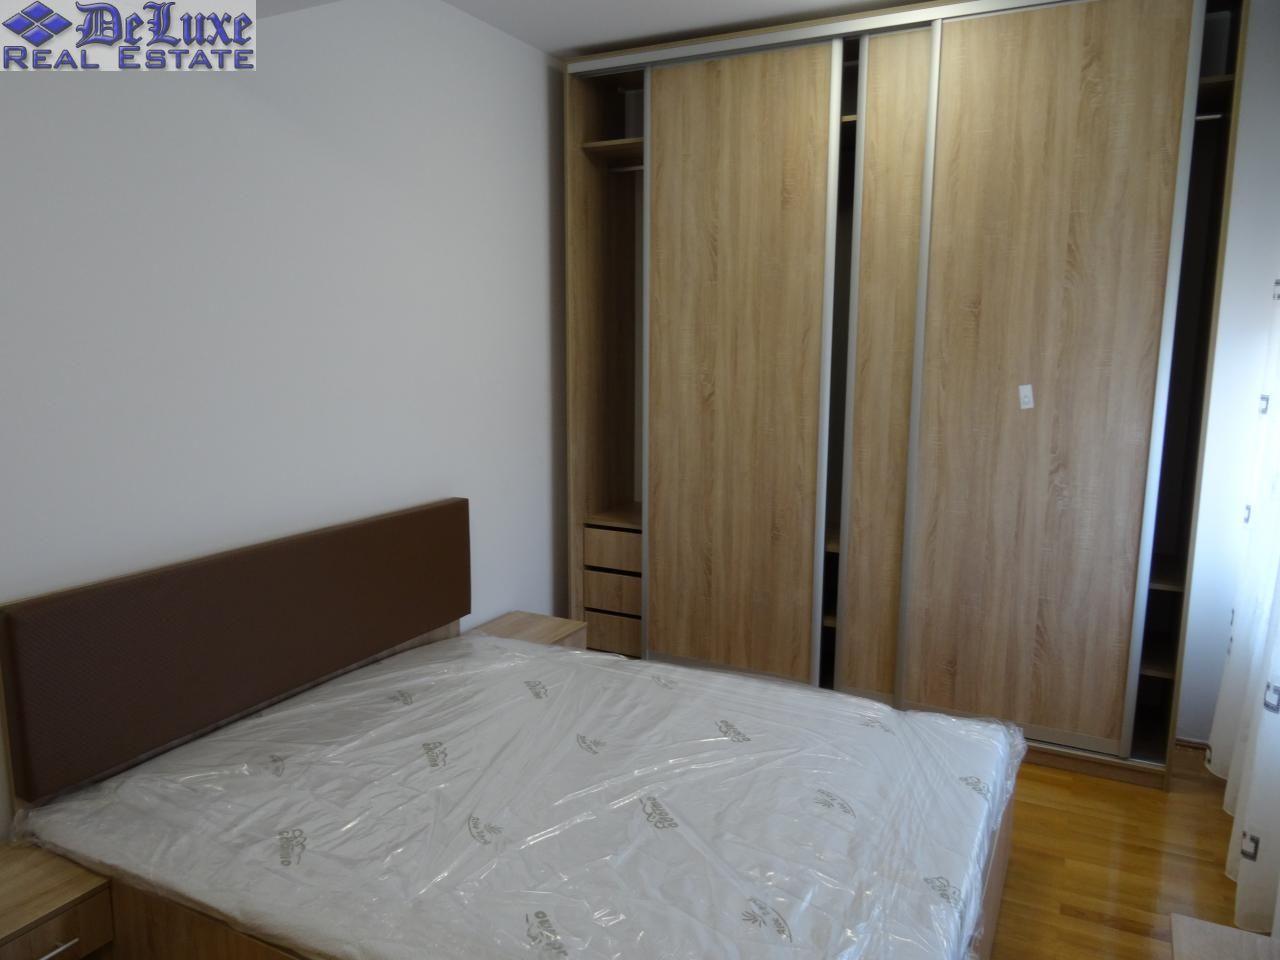 Apartament de inchiriat, București (judet), Dorobanți - Foto 10